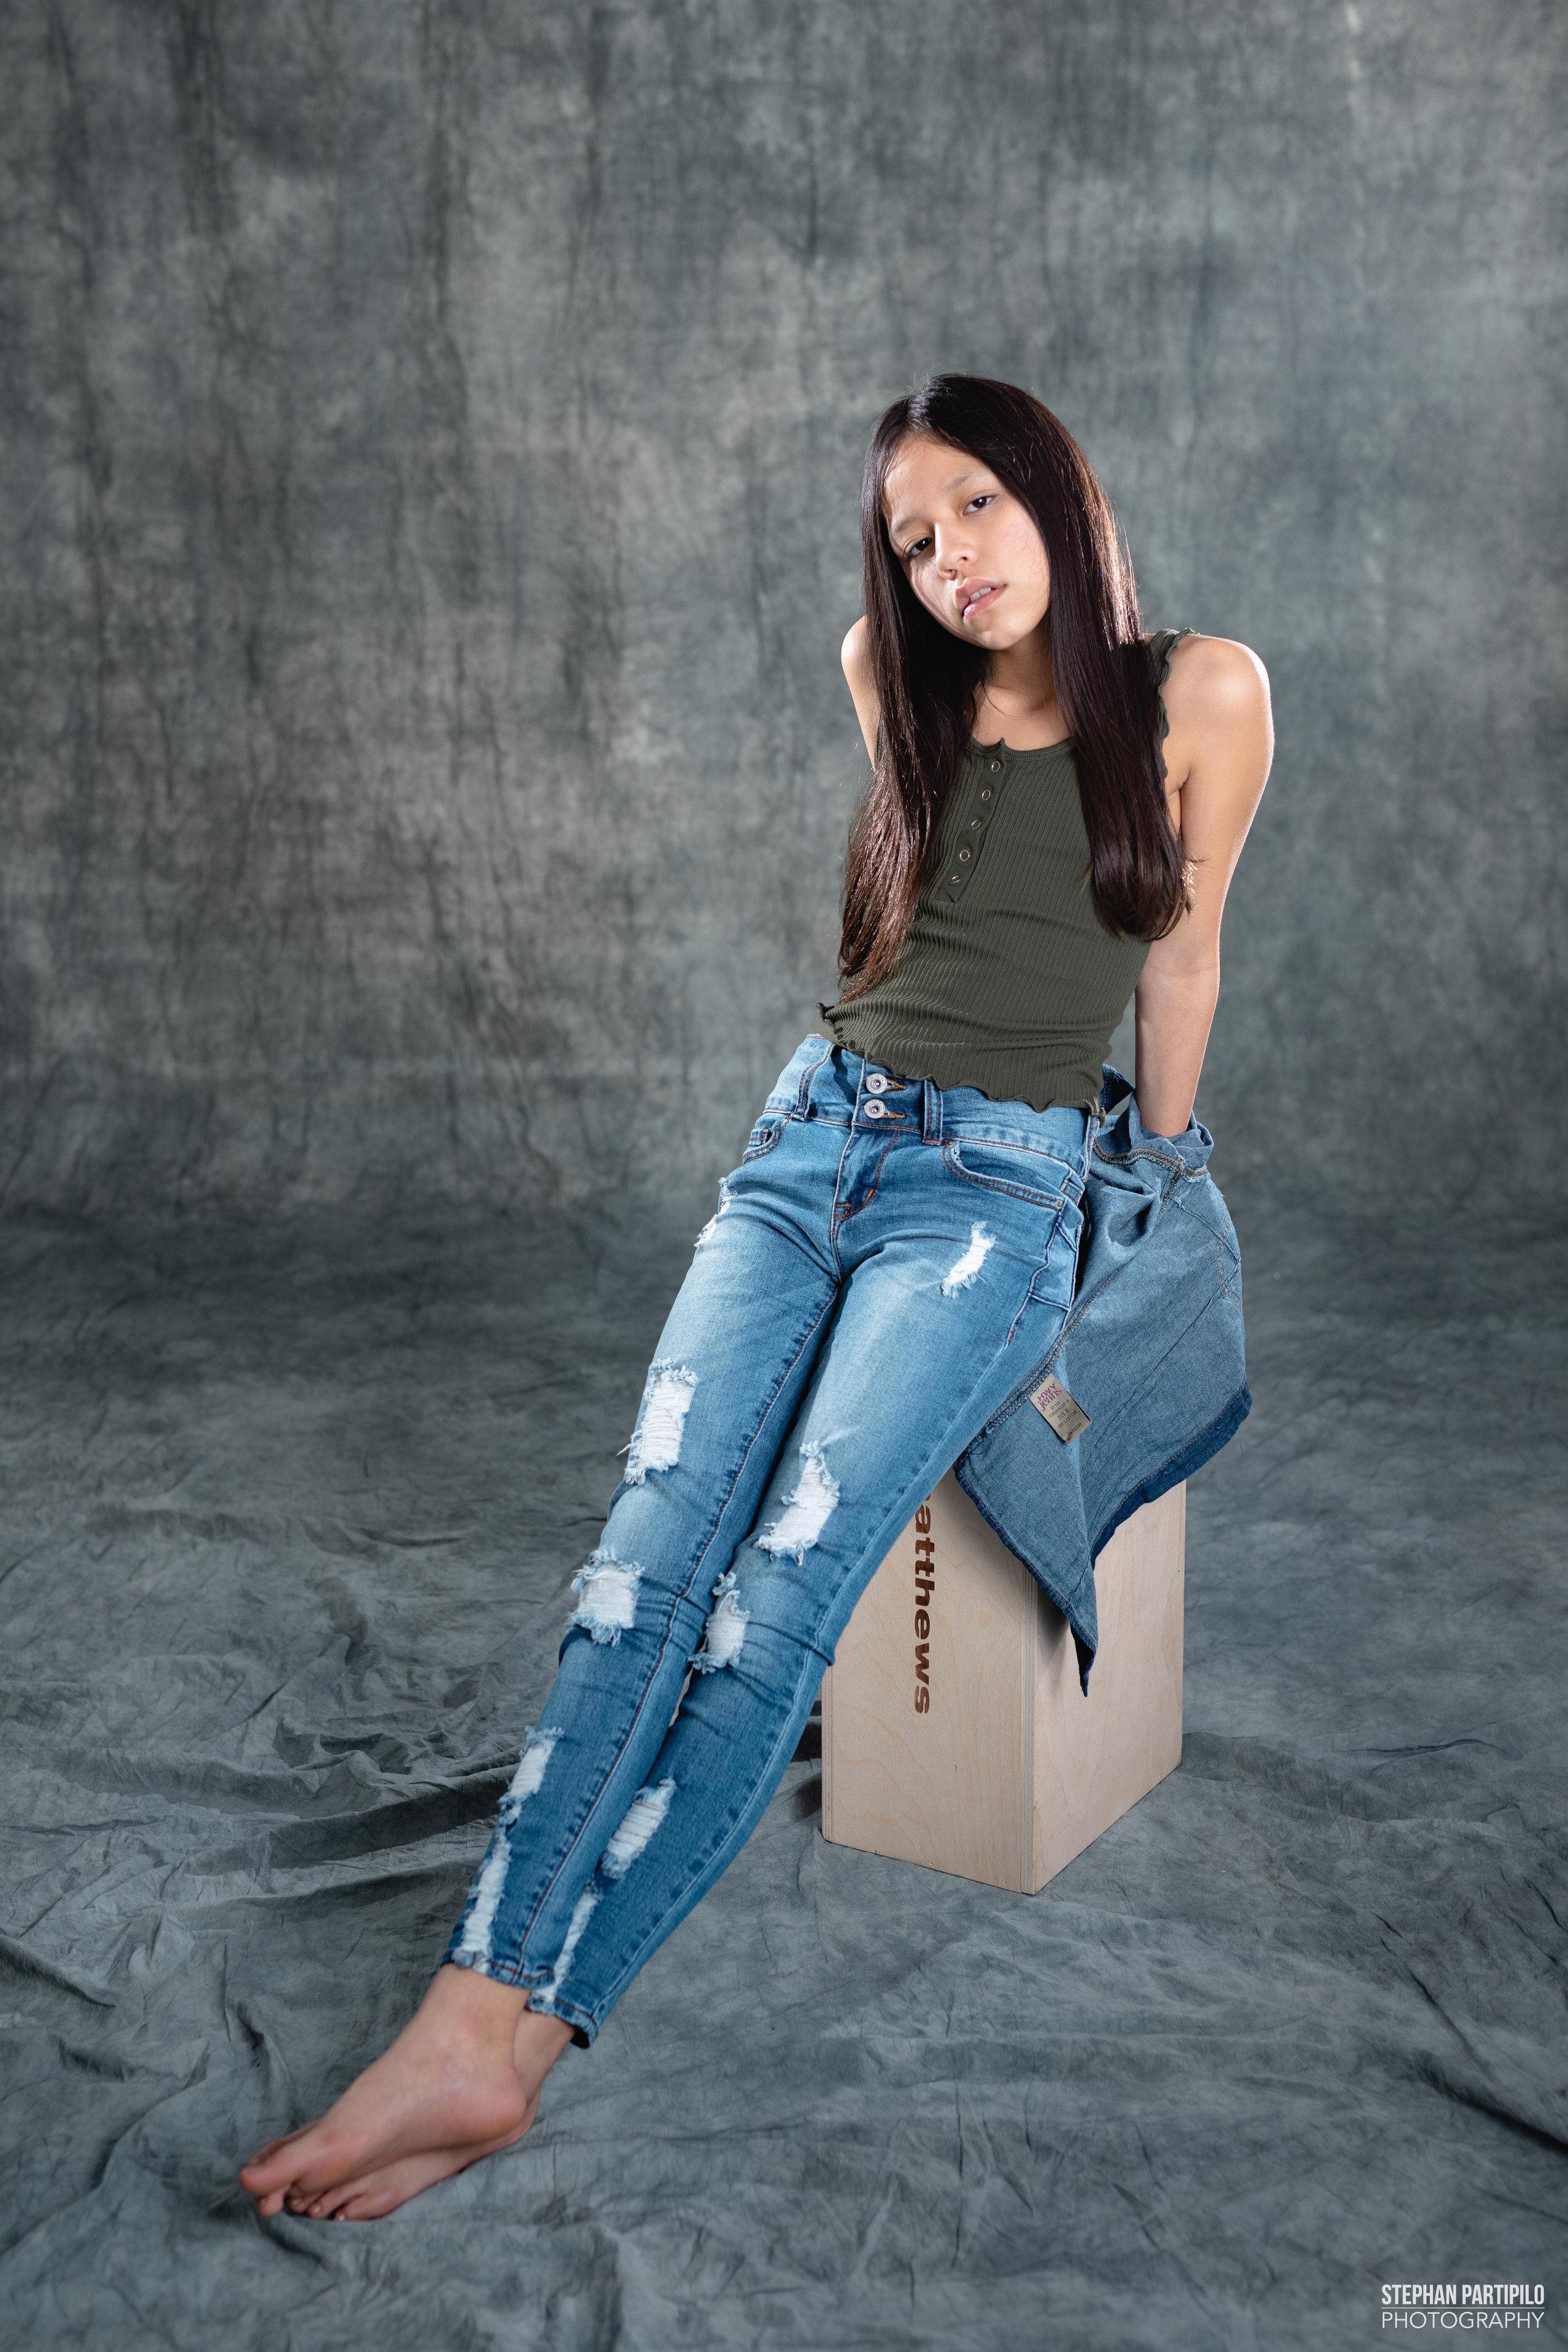 Marisol Child Model PDX 2019 0G5A9602.jpg